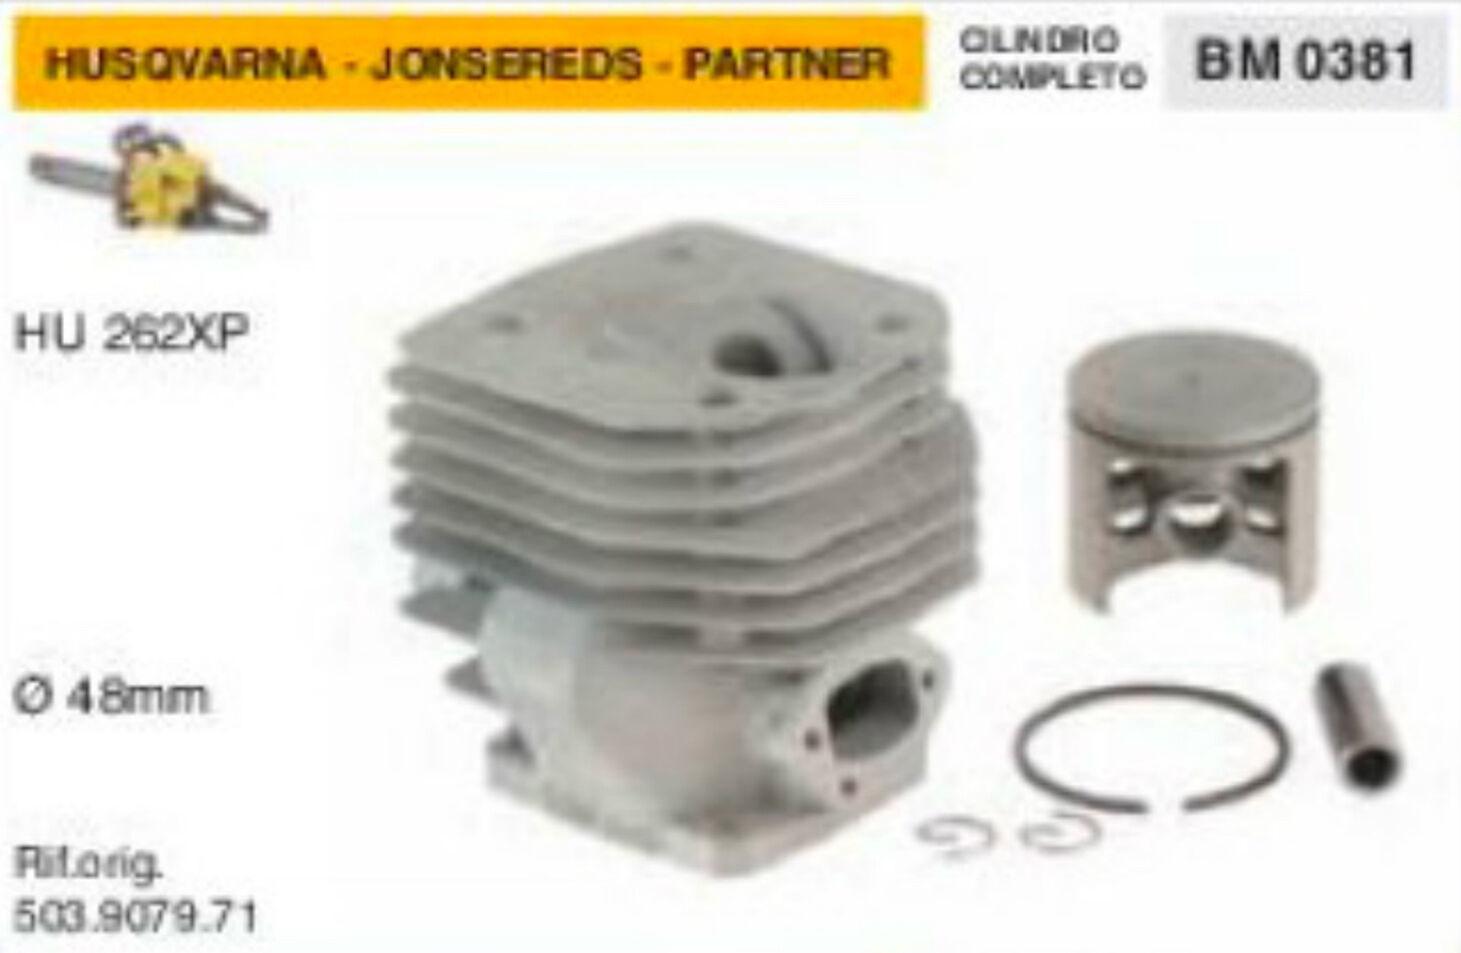 503.9079.71 Cylindre et Piston Scie à Chaîne Husqvarna Apps Hu 262 XP Ø 48 Mm